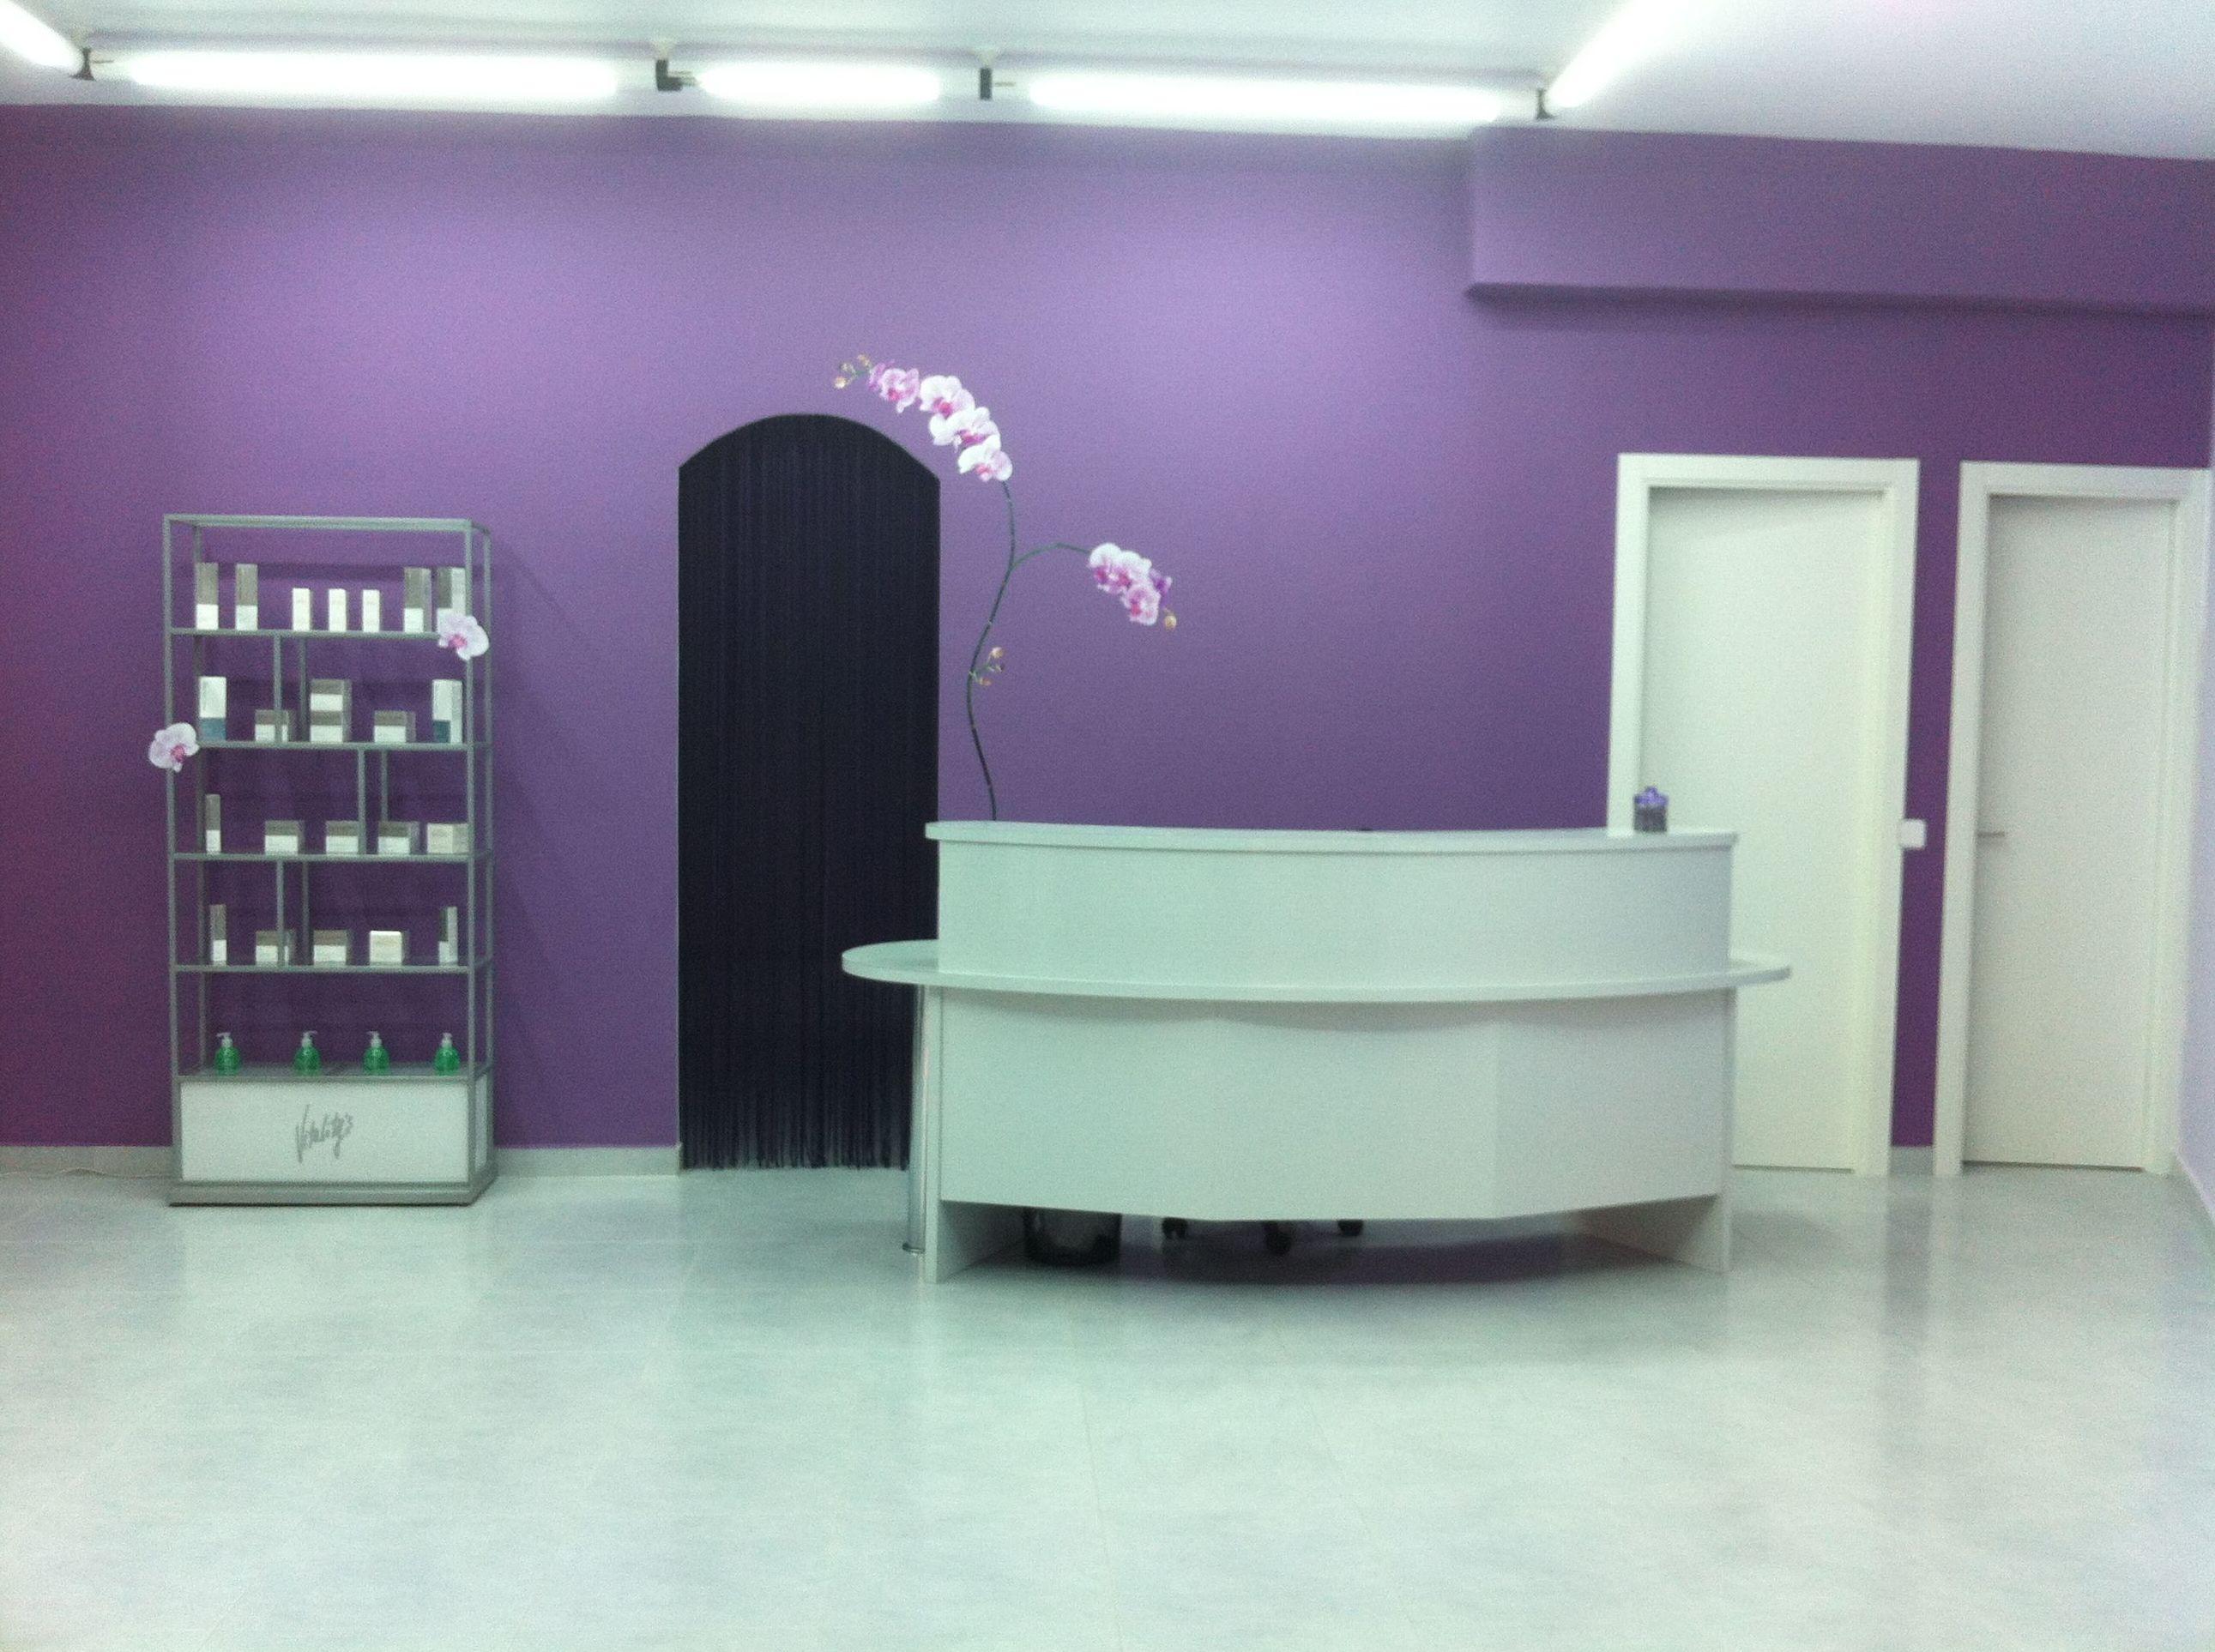 Centro de Estética Laura Quiroga